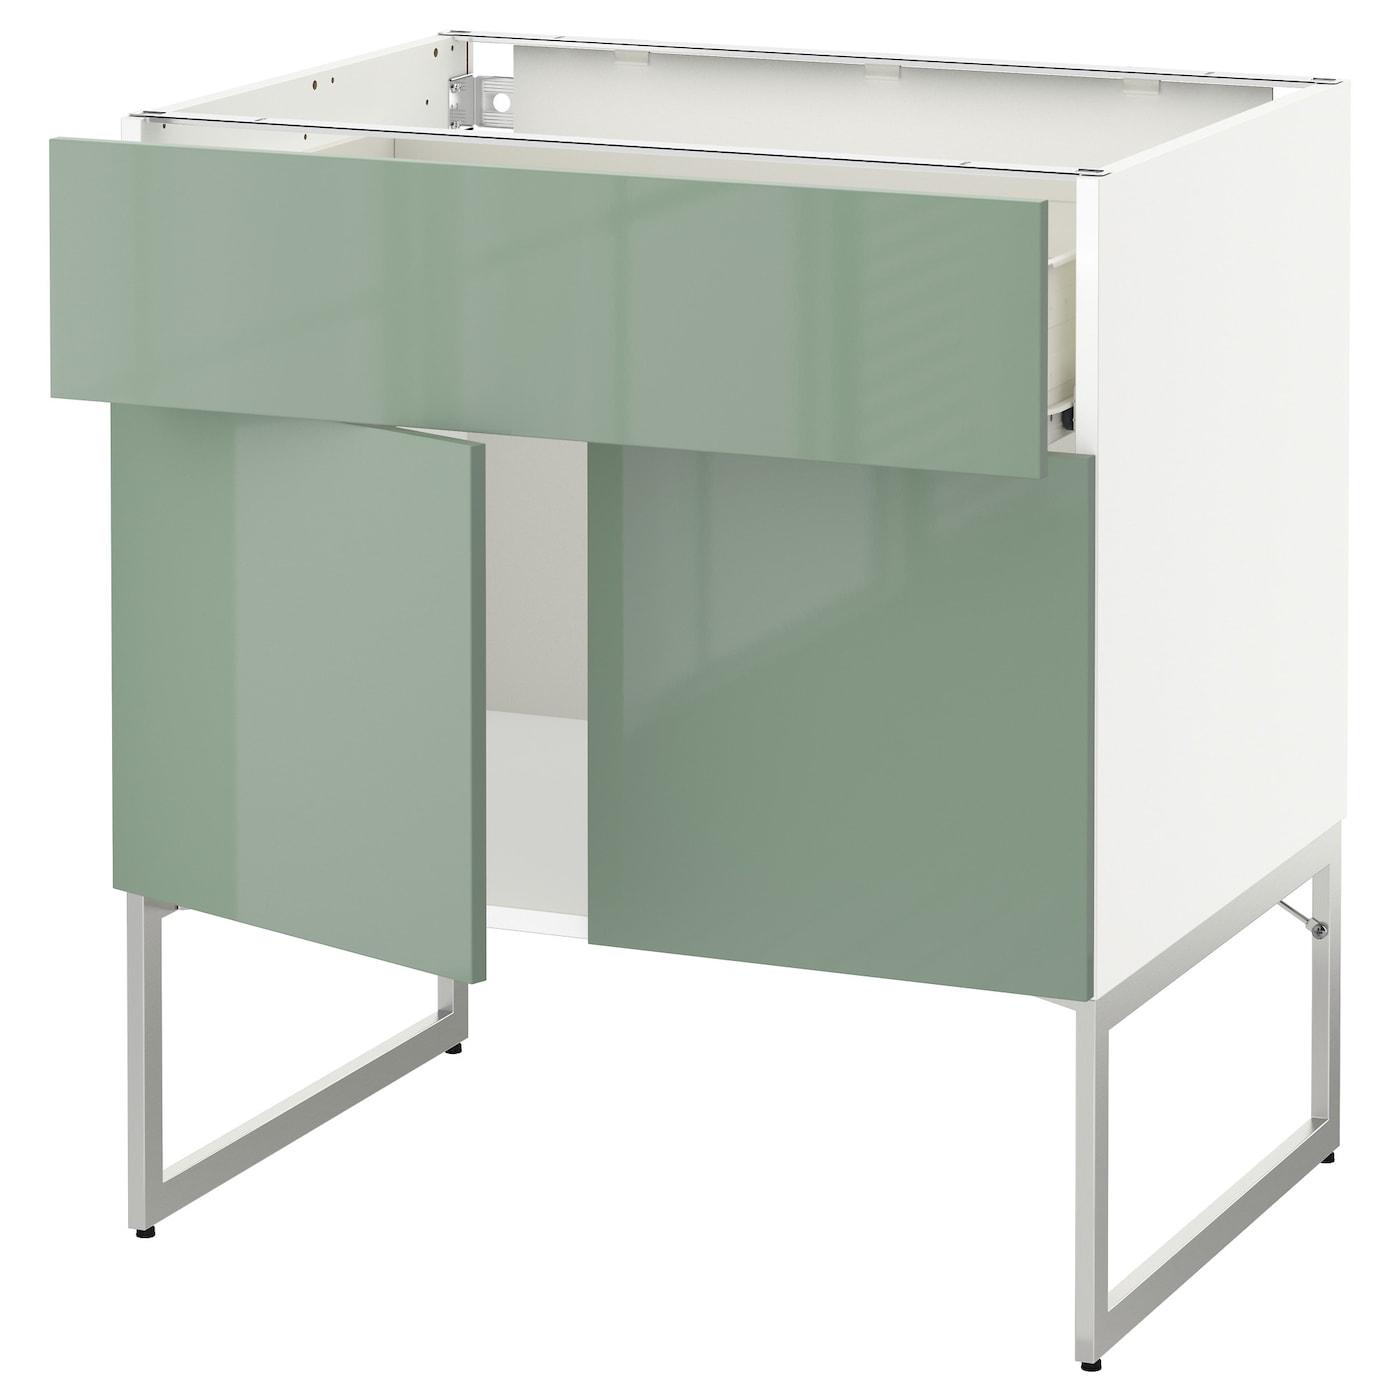 Ikea Green Kitchen Cabinets: METOD/FÖRVARA Base Cabinet/shelves/drawer/2 Doors White